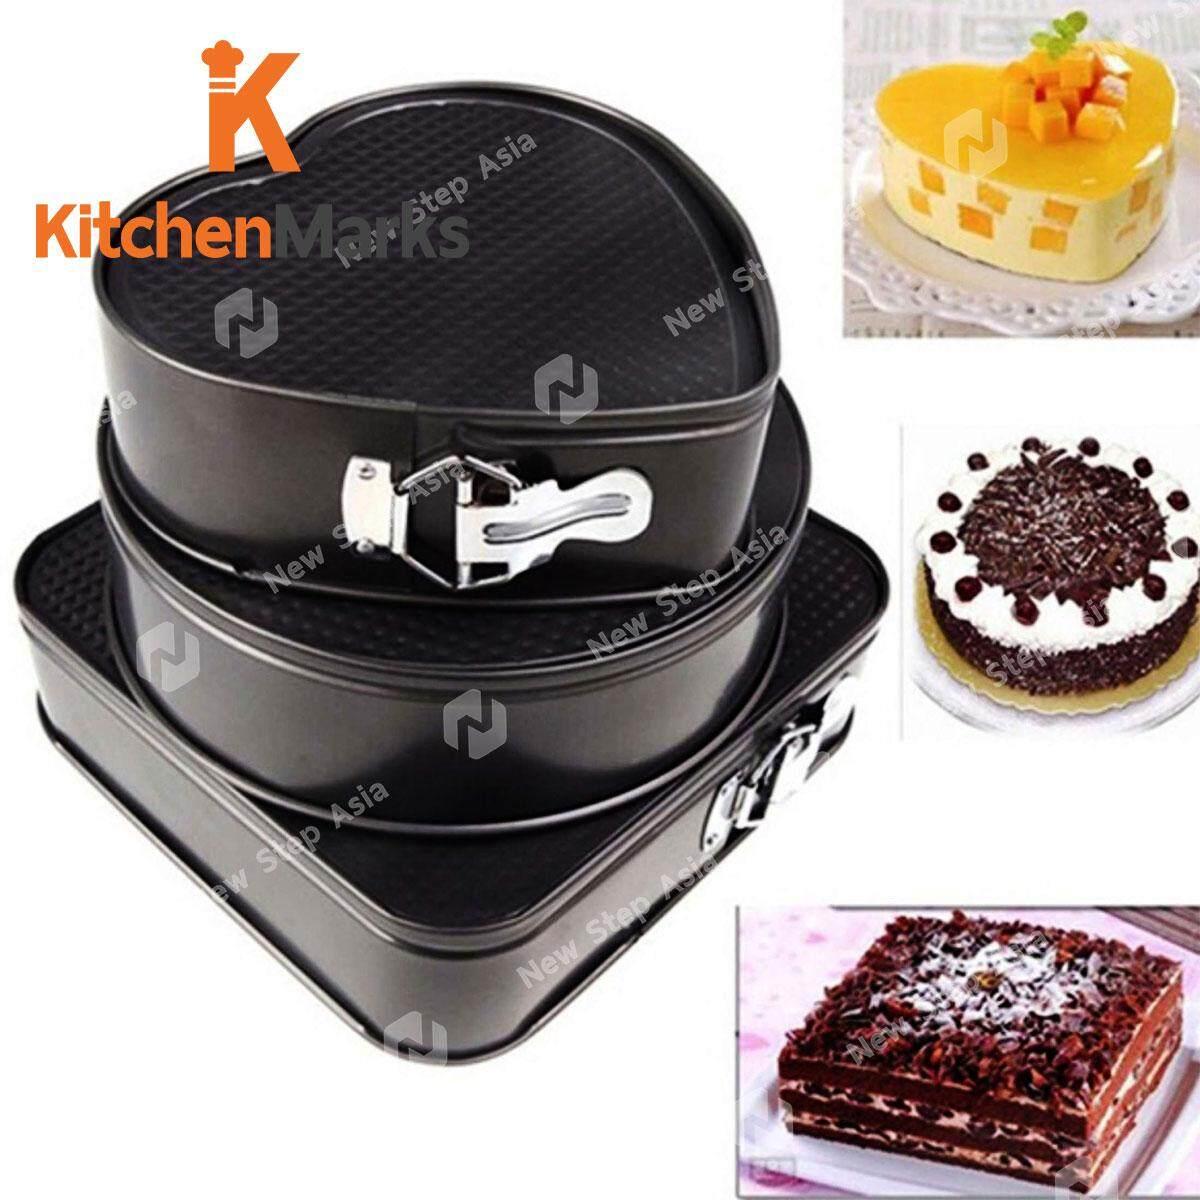 Kitchenmarks เซทแม่พิมพ์เค้ก 3 ชิ้น แม่พิมพ์เค้ก พิมพ์เค้ก พิมพ์ขนม ถาดอบขนม ถาดอบเค้ก.